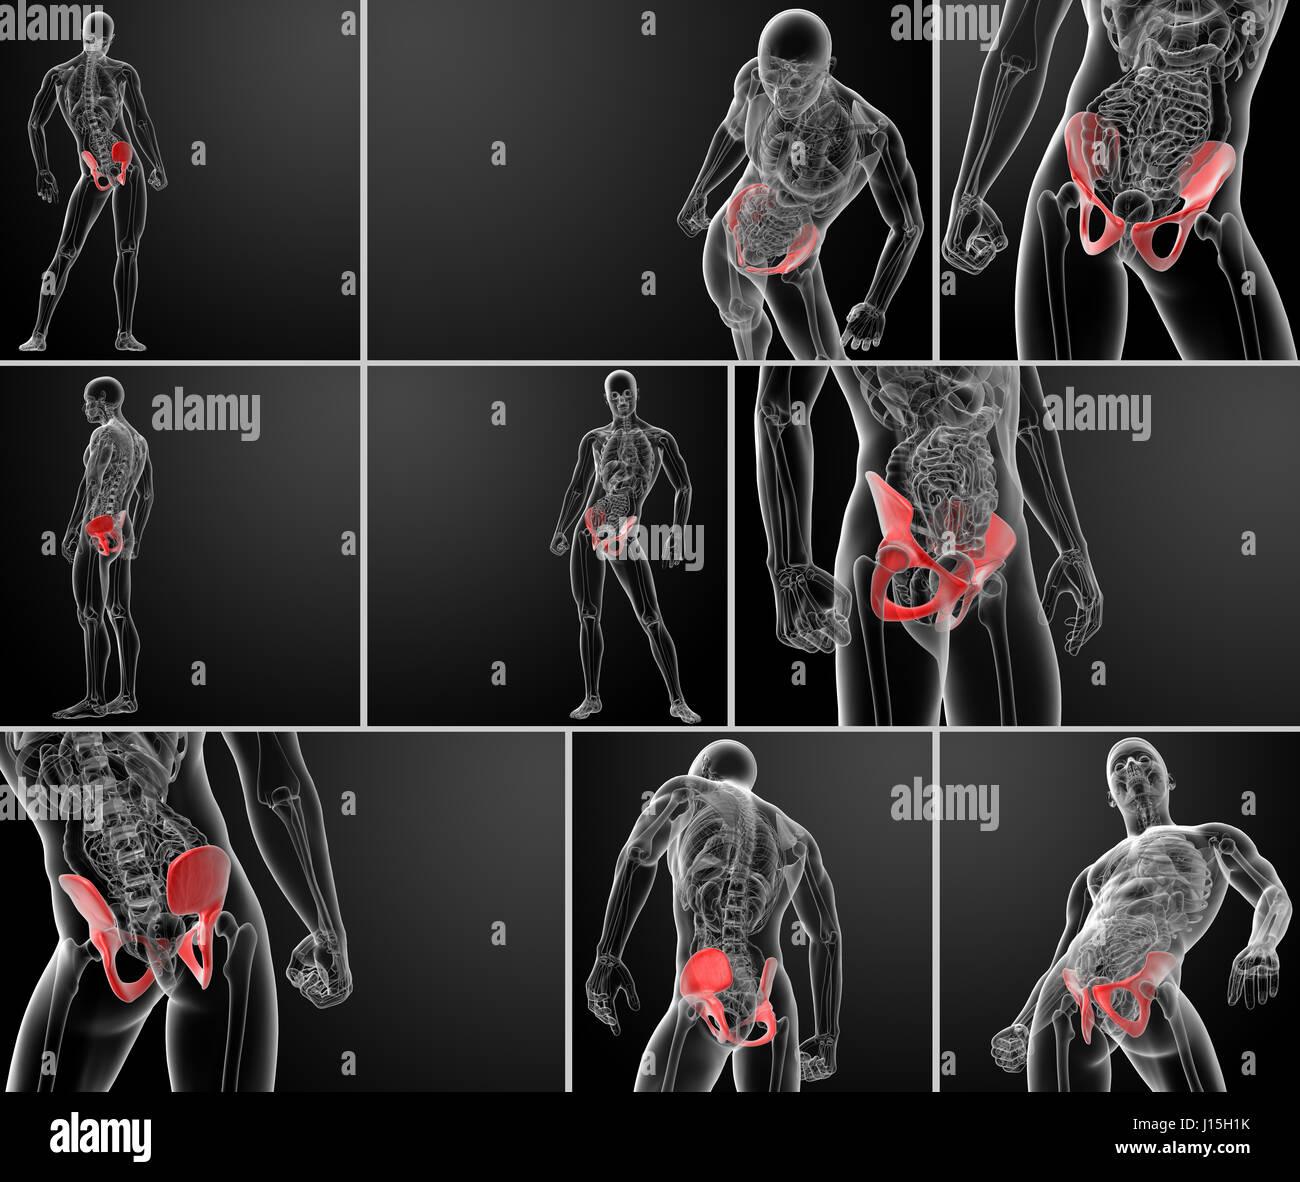 3d rendering pelvis under the X-rays - Stock Image